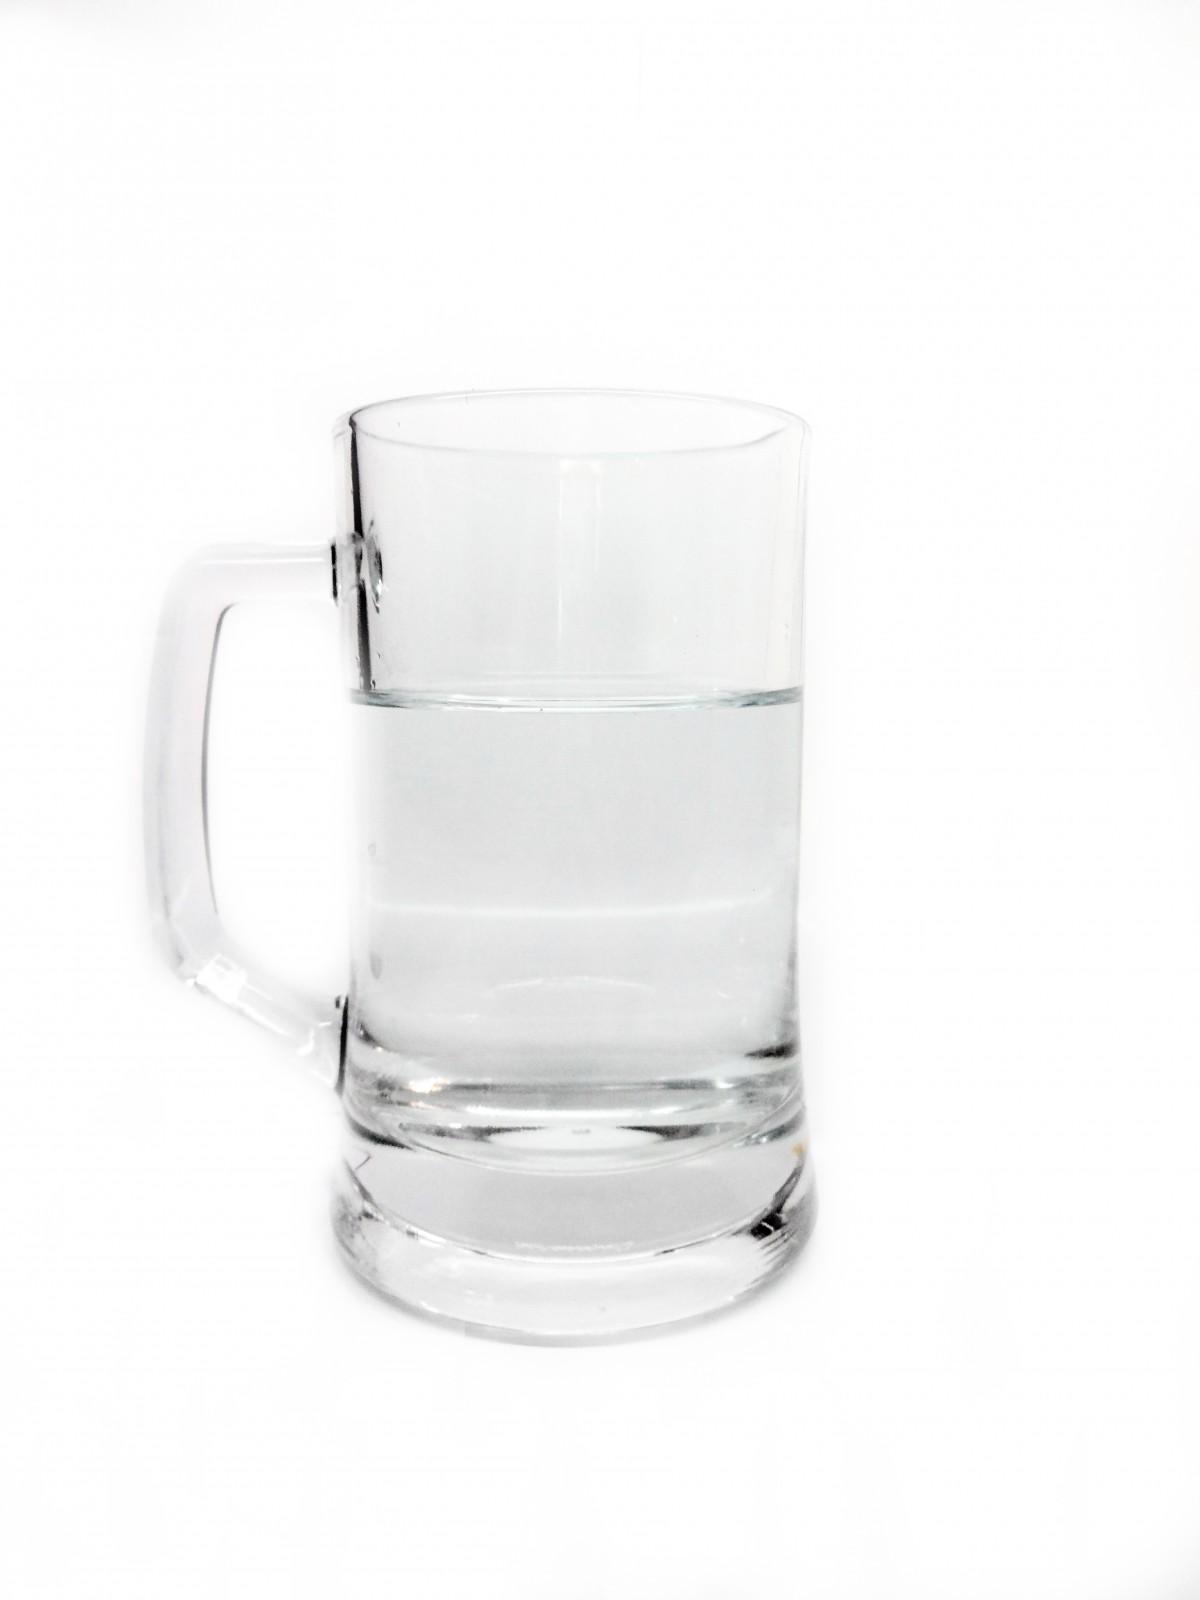 Gambar Tangan Cangkir Minum Mangkok Barang Pecah Belah